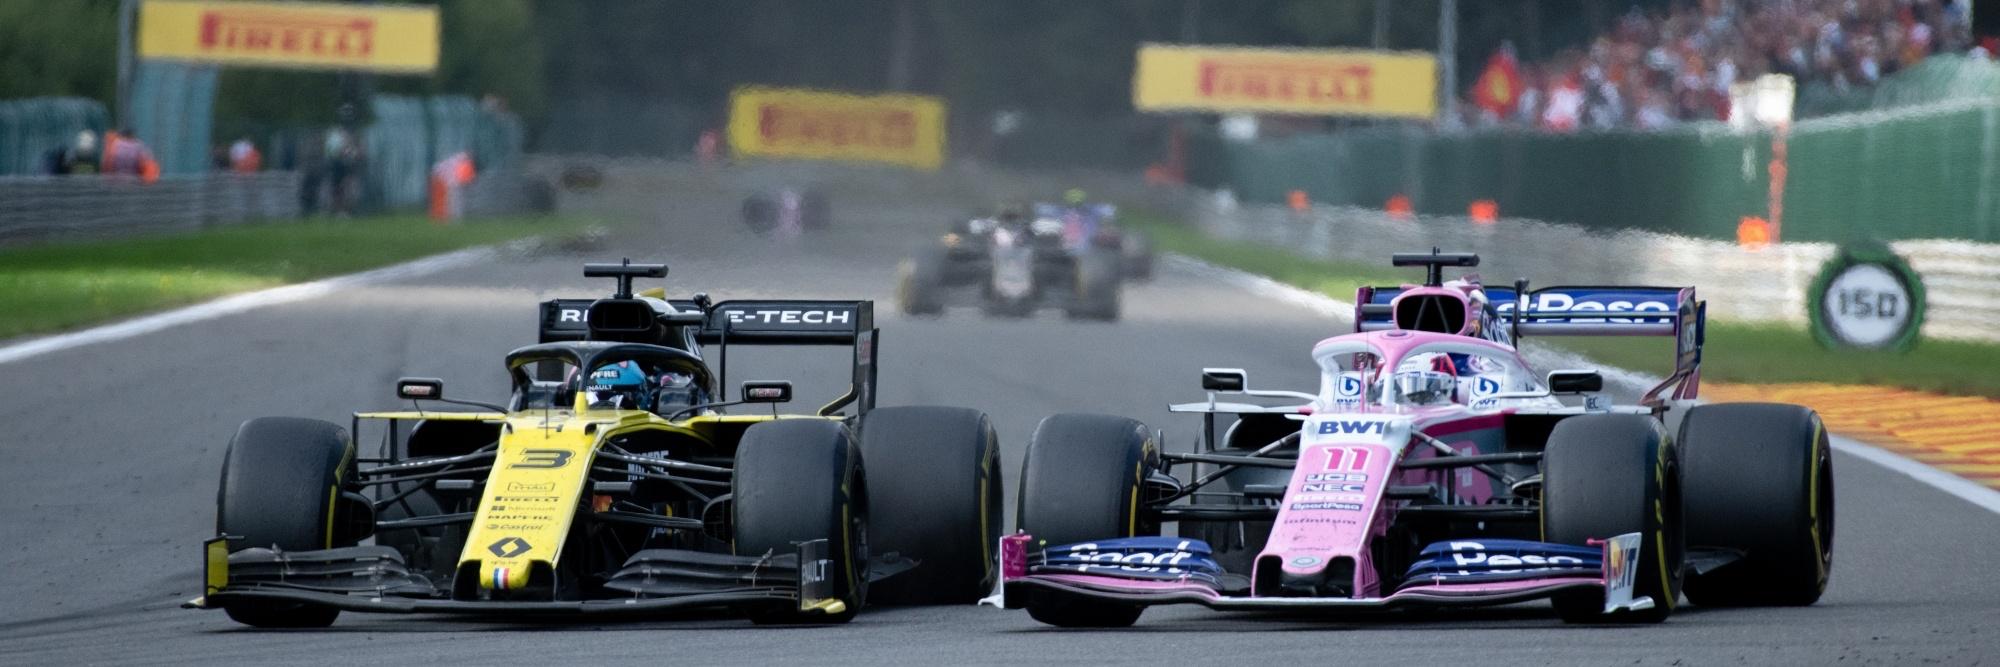 Formula 1 Belgian Grand Prix slide 2